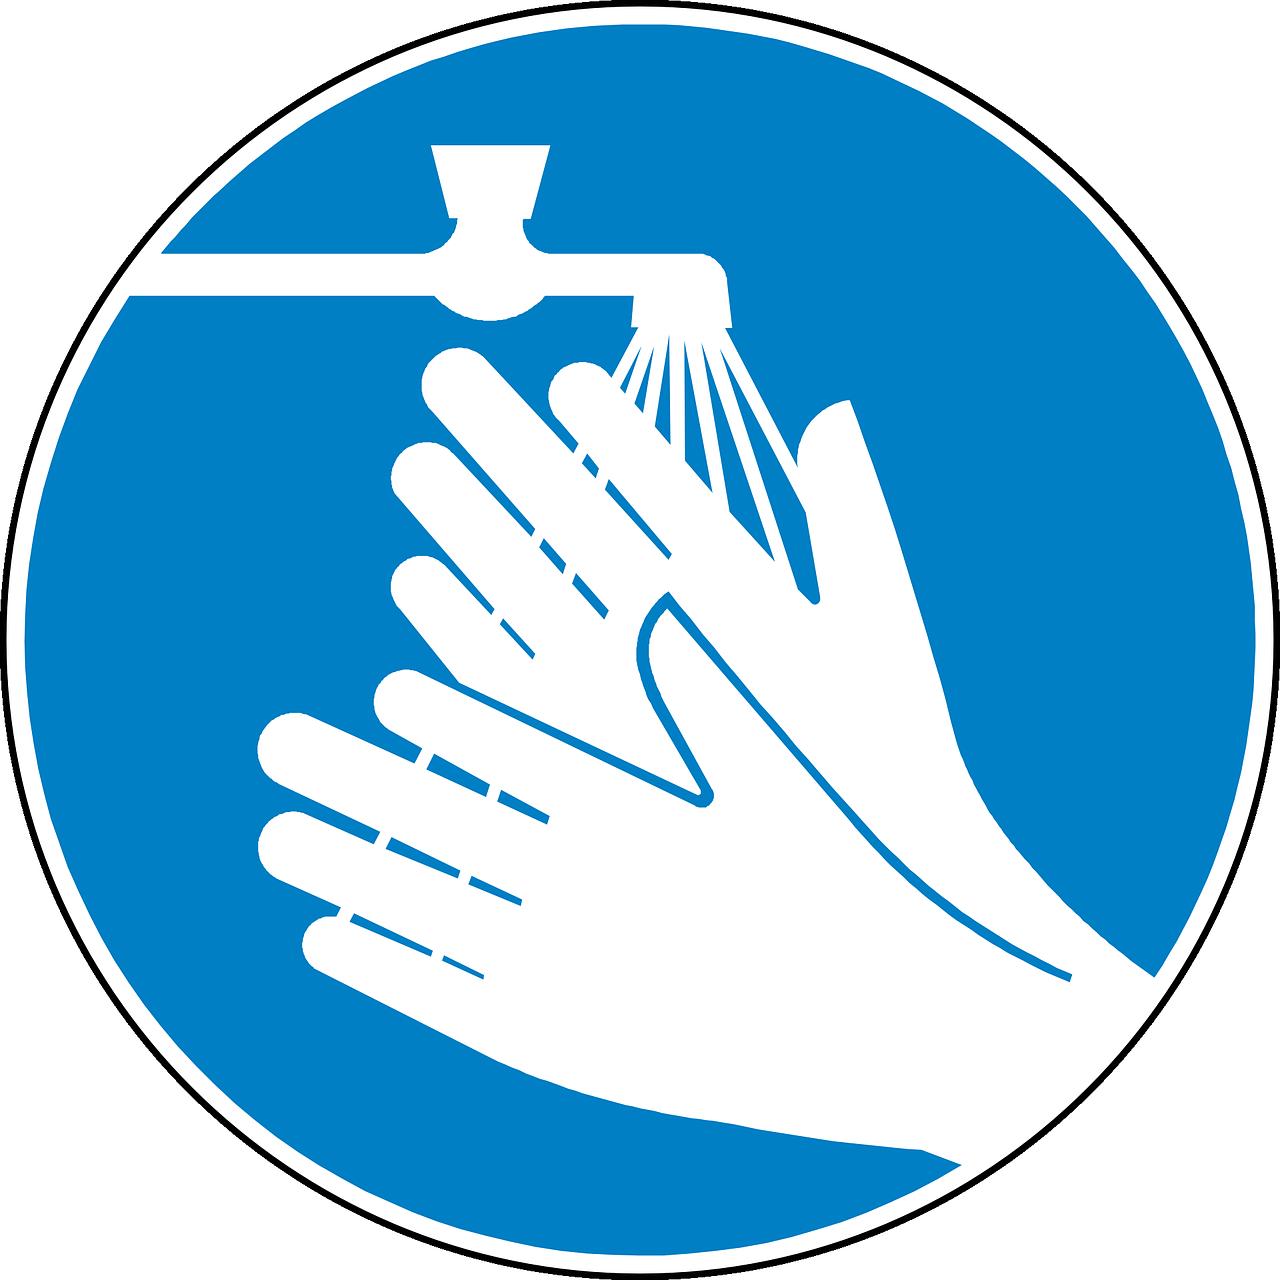 wash-hands-98641_1280